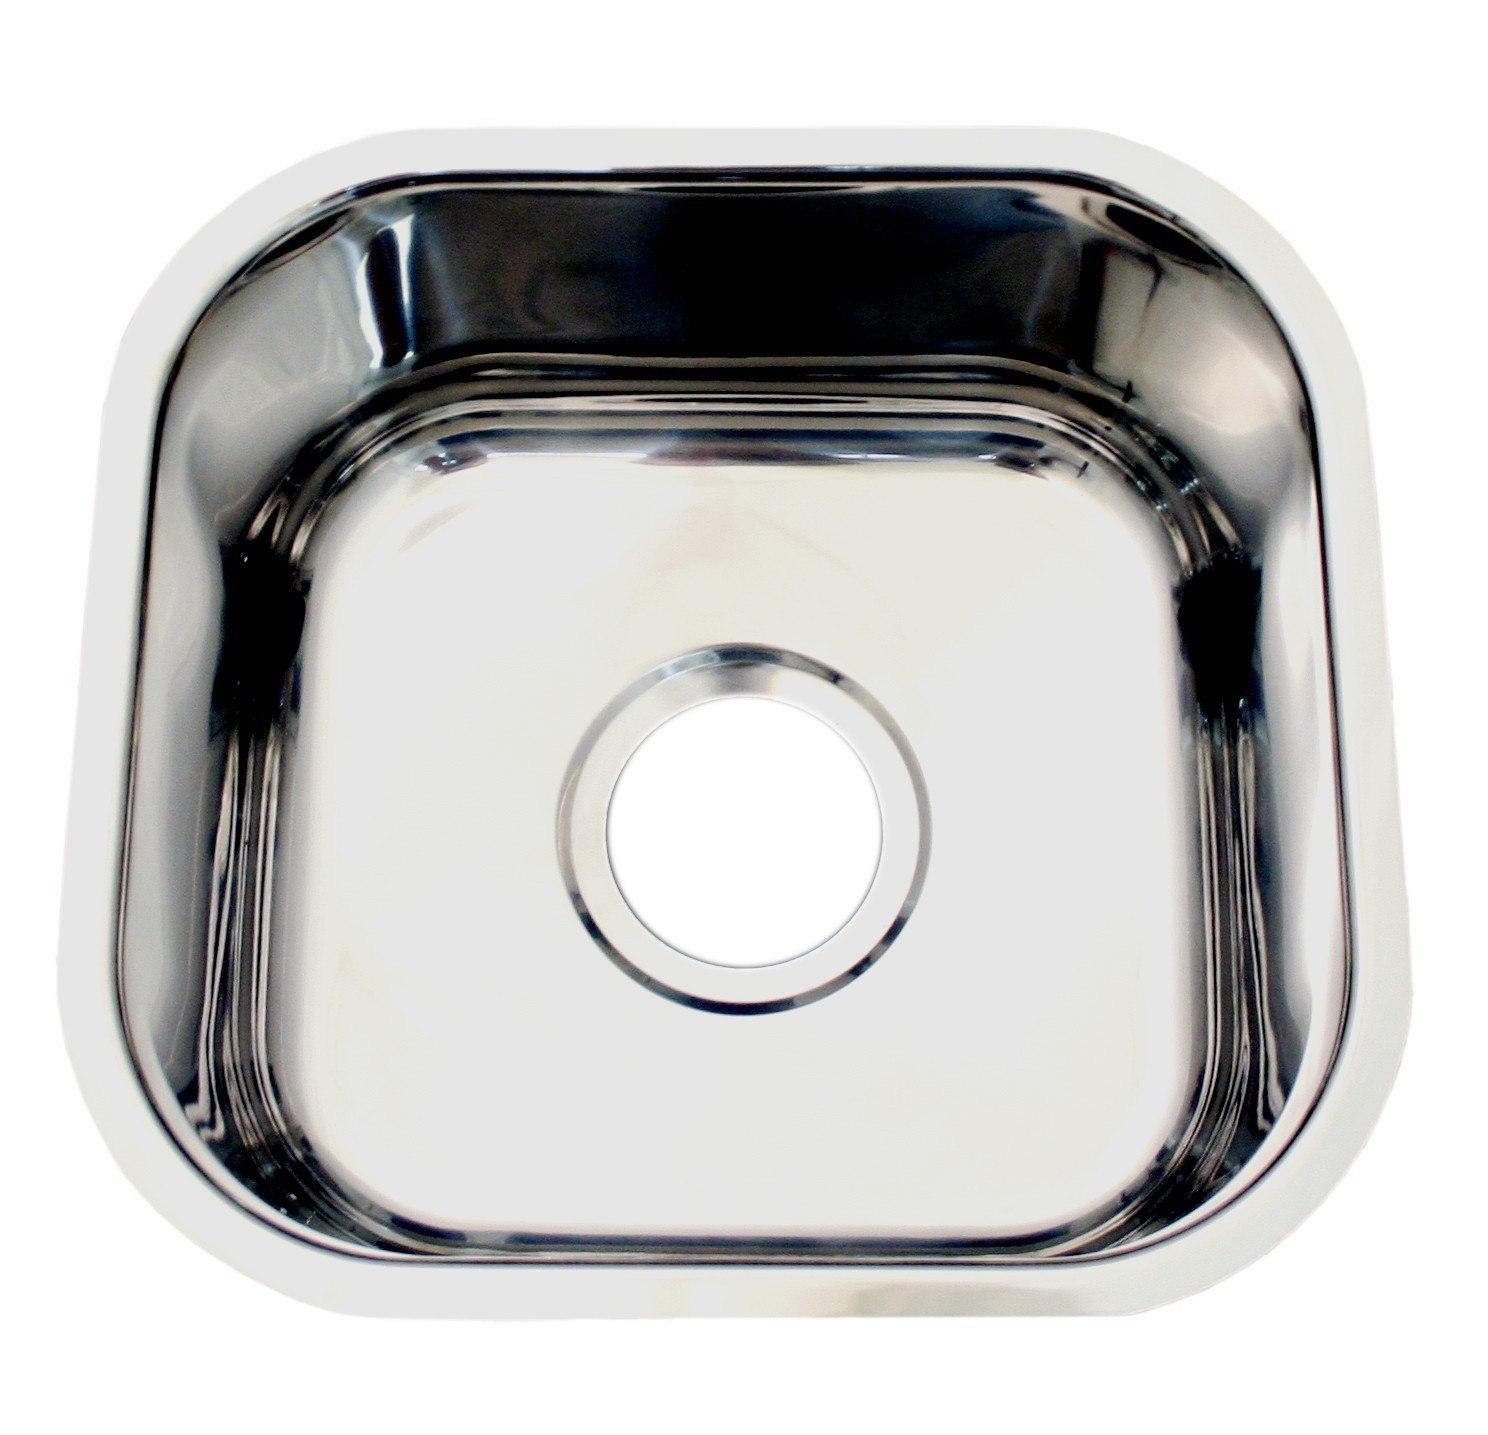 WHNU1212-BSS 12 7/8 Inch Noahs Collection Single Bowl Undermount Sink ...